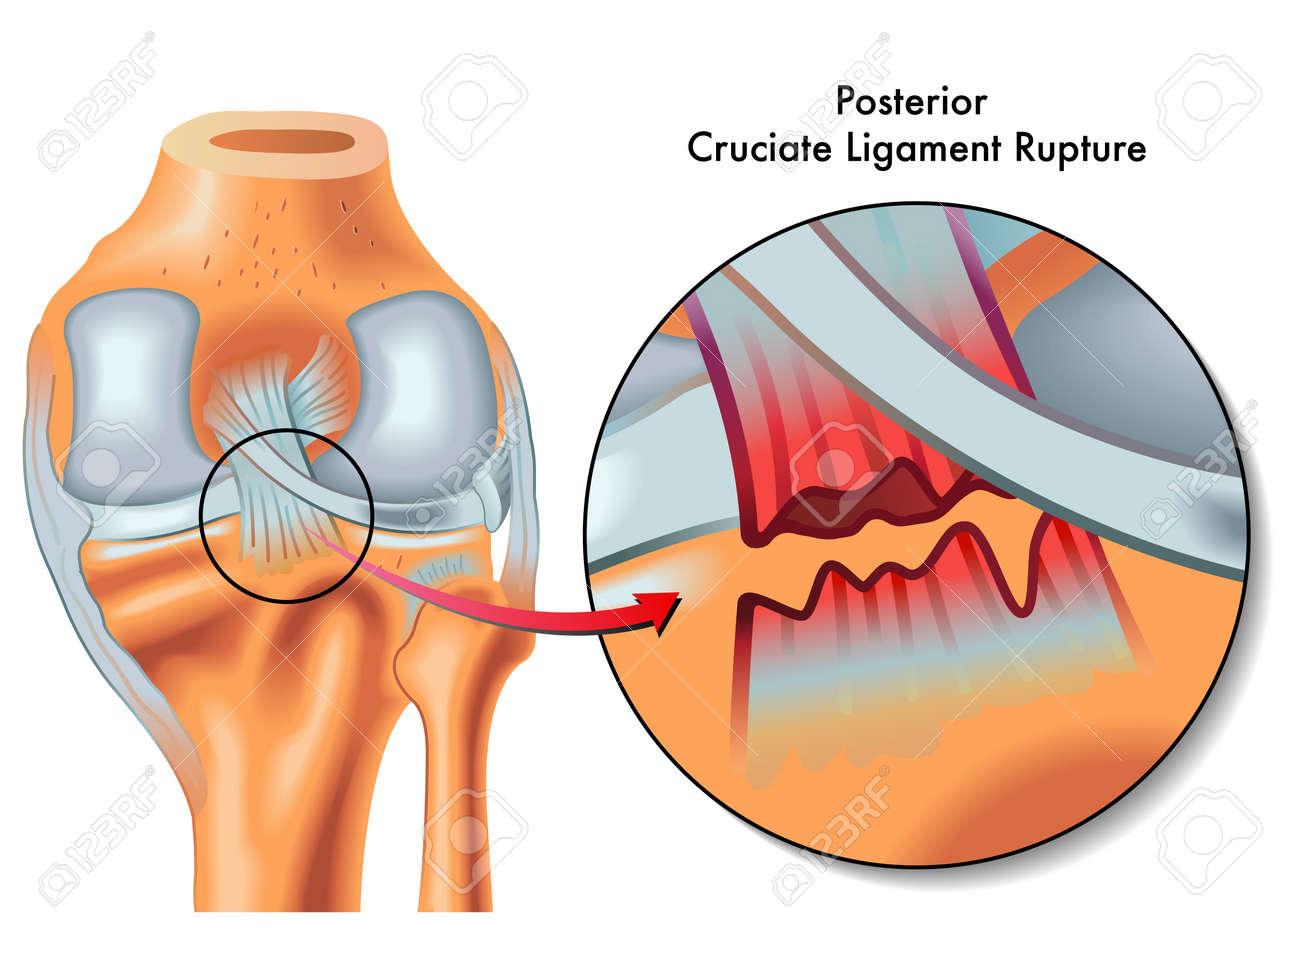 Posterior cruciate ligament rupture - 23117017